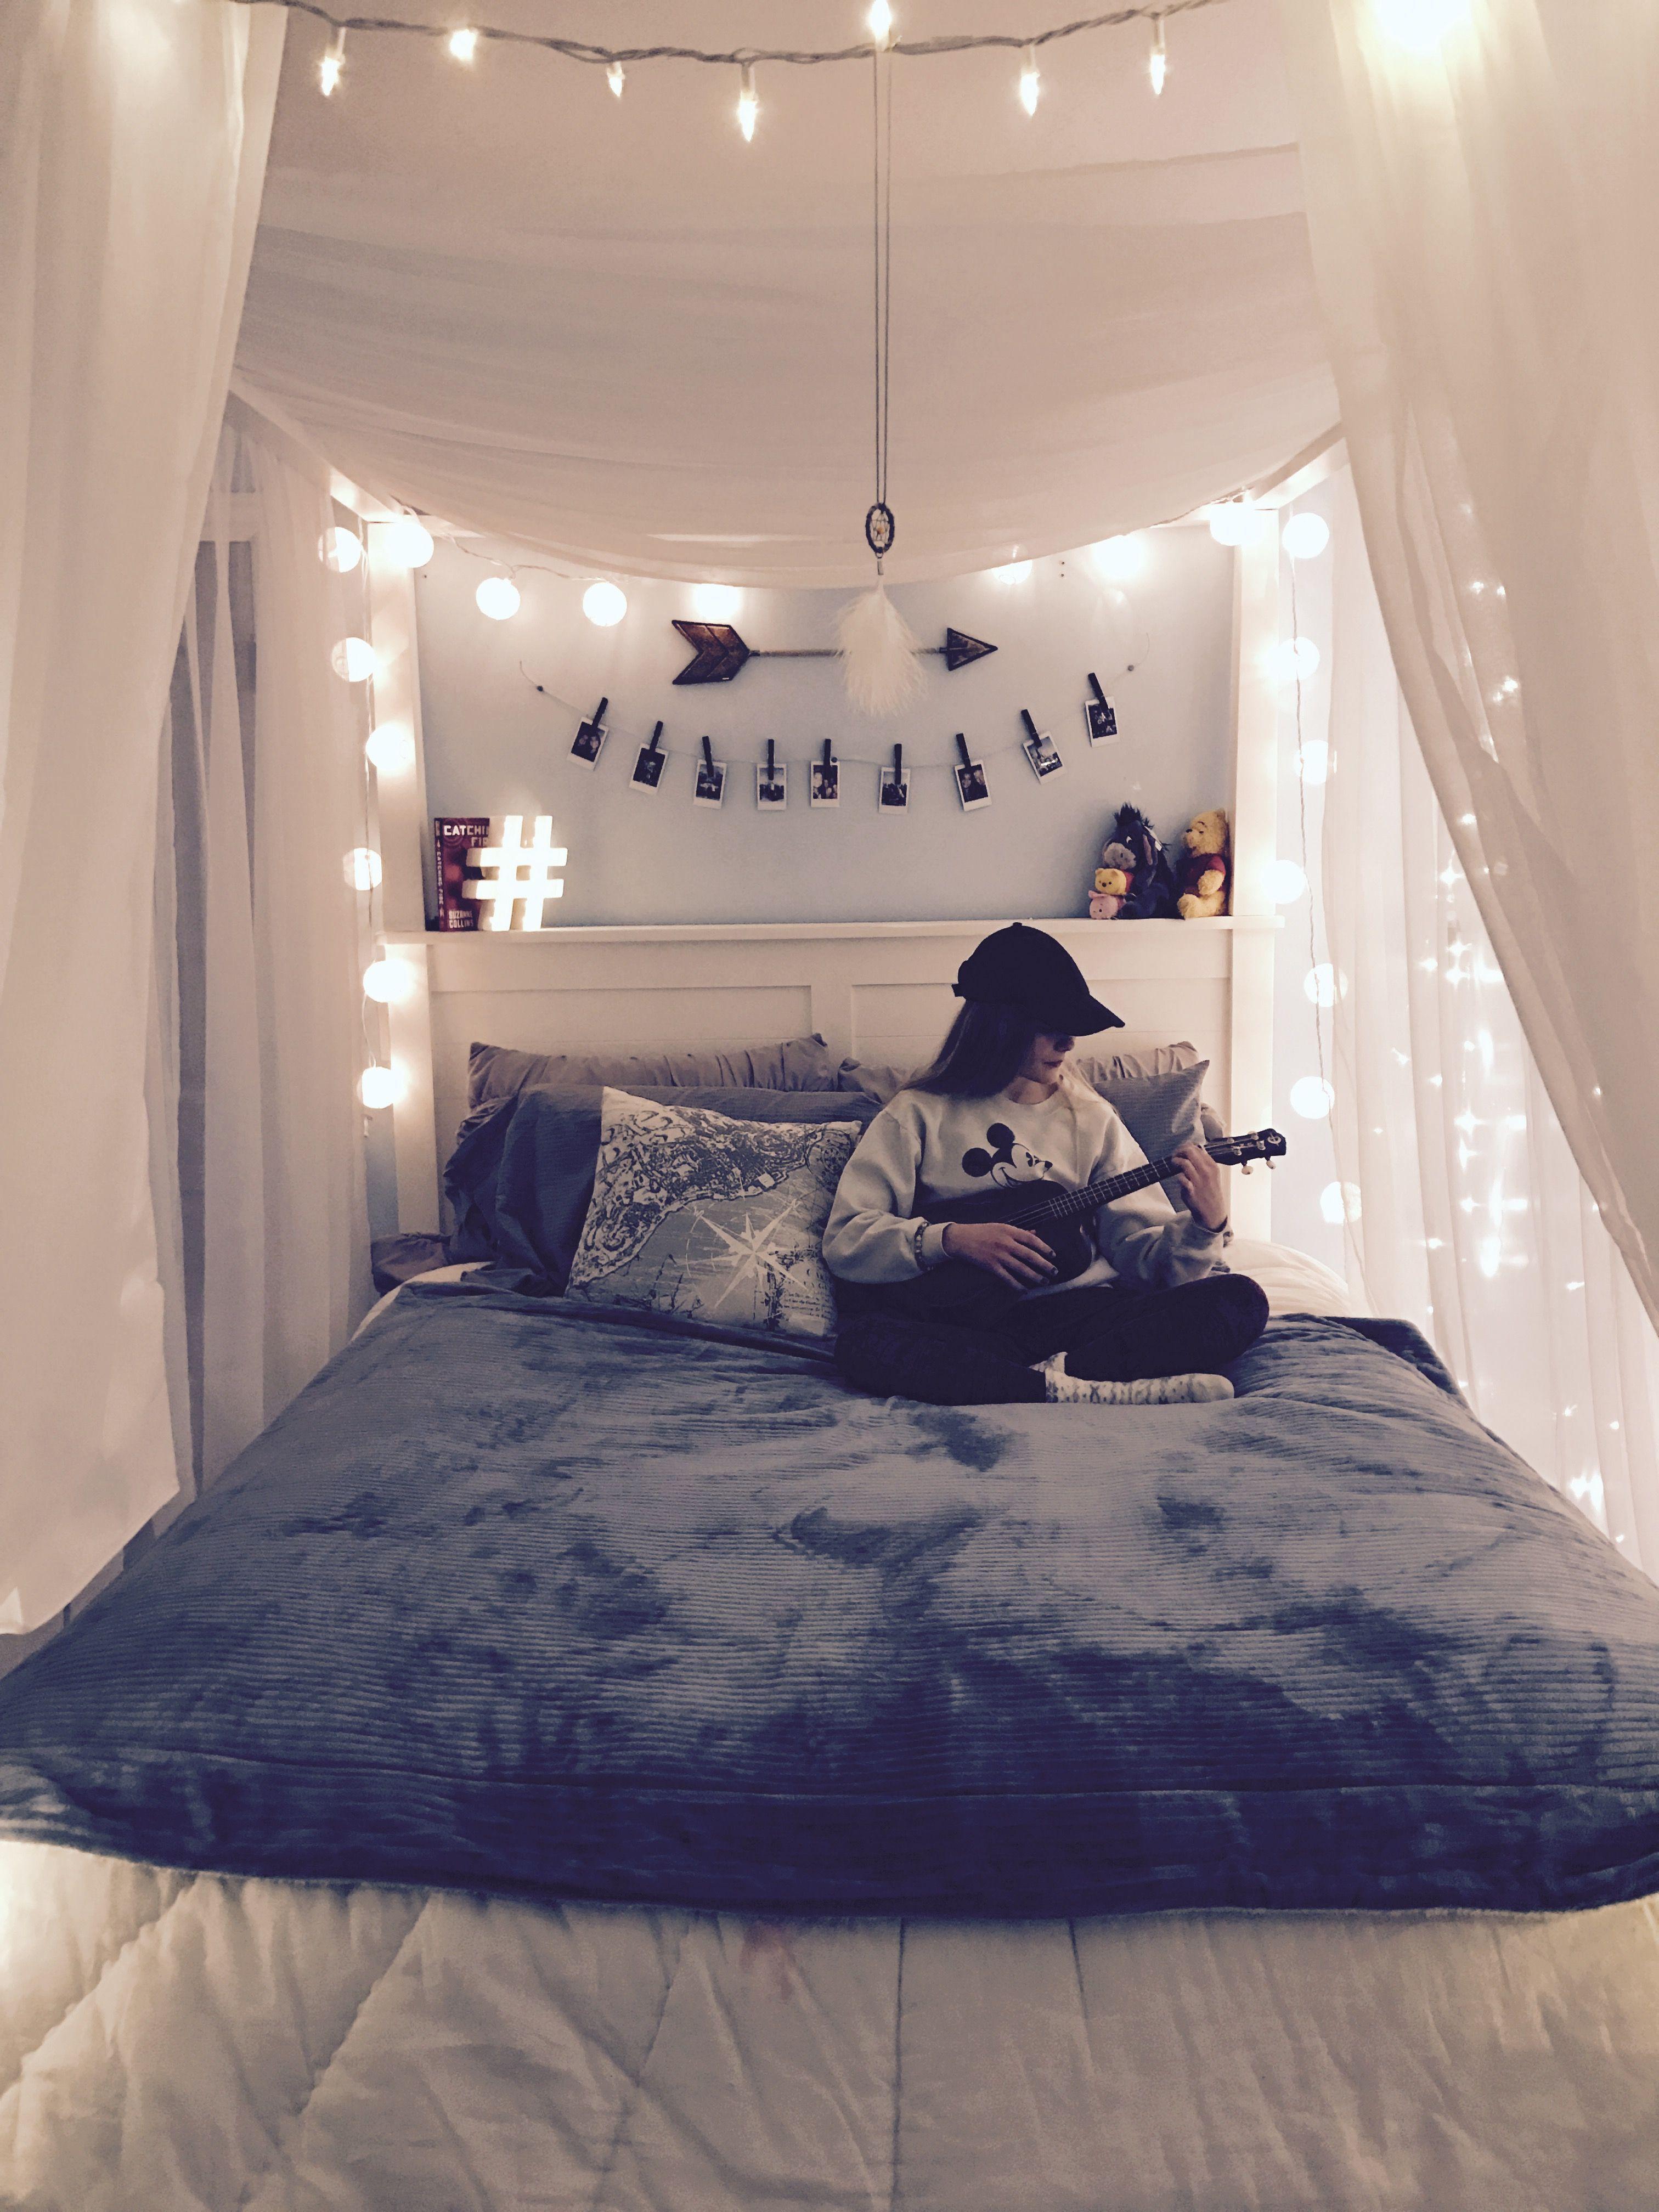 Teen Girl Bedroom Makeover Ideas  DIY Room Decor for Teenagers